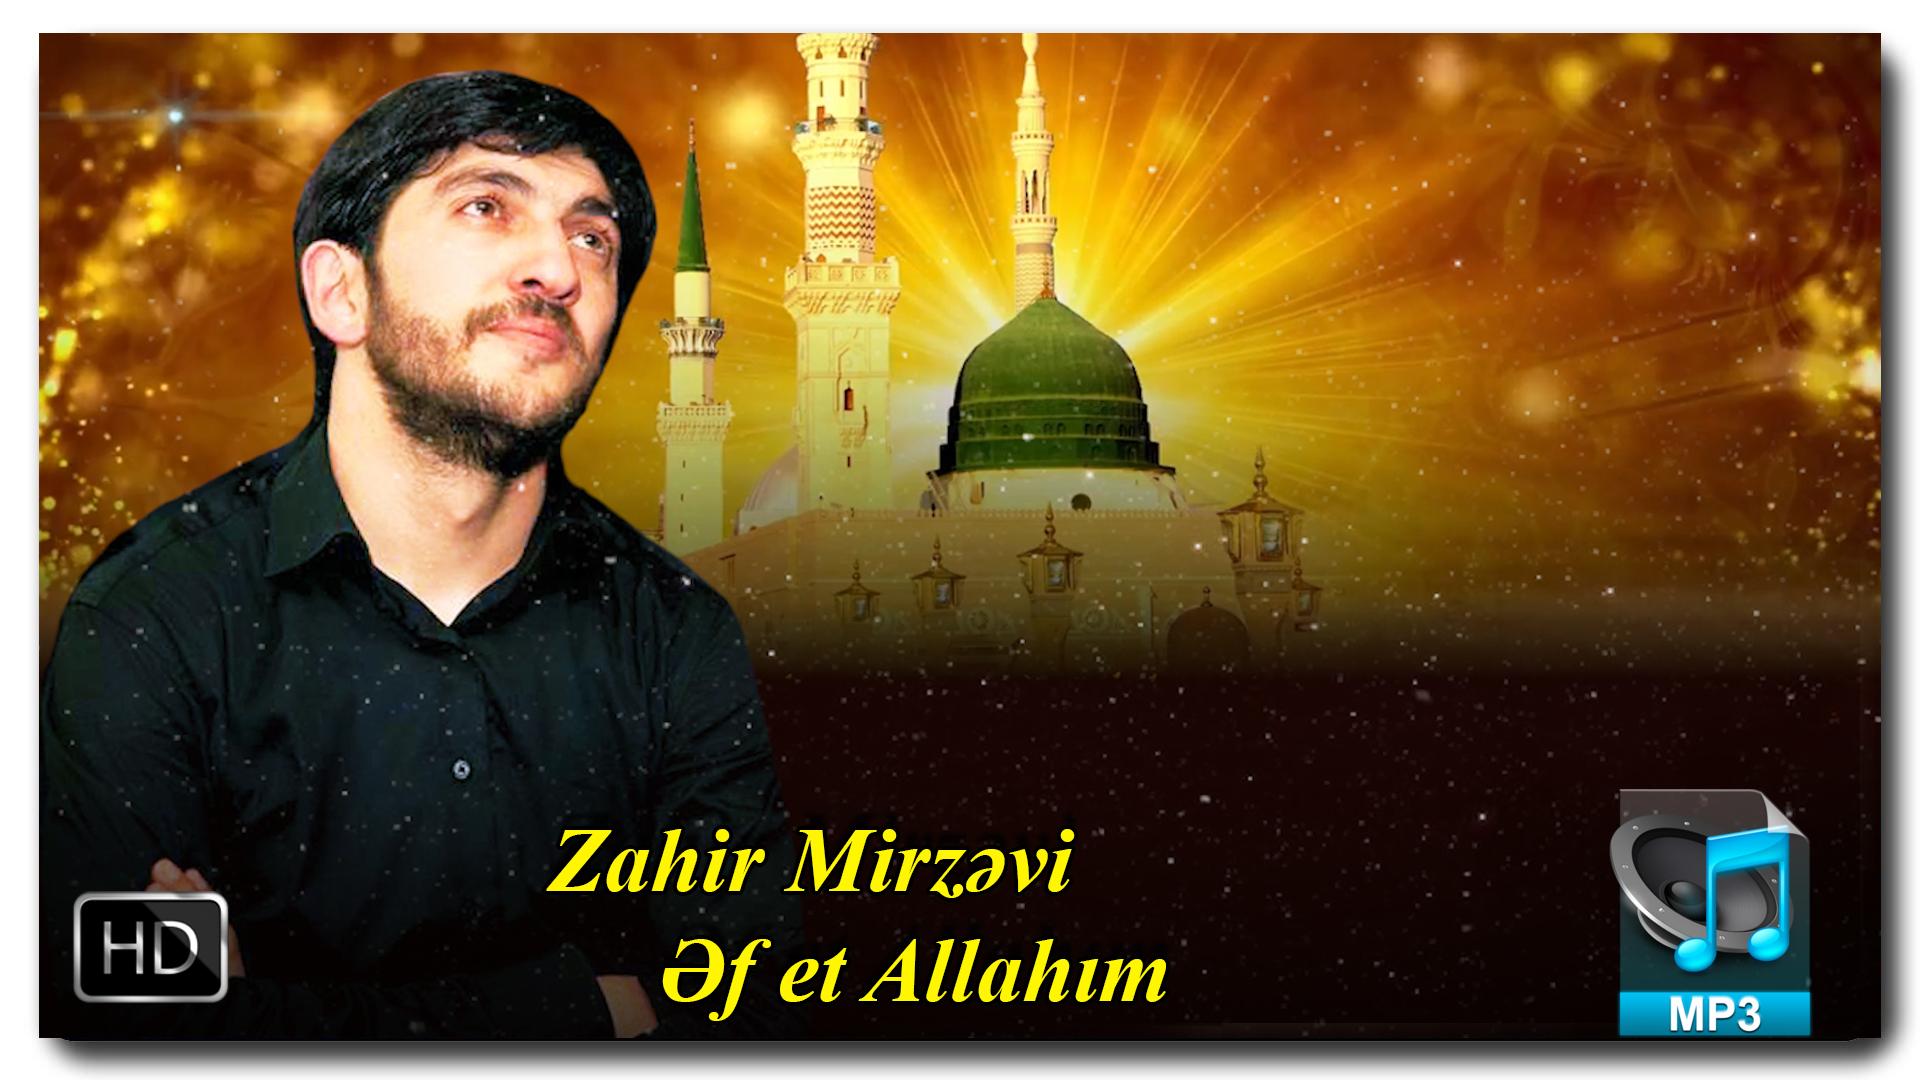 Yeni ilahi musiqi | Zahir Mirzəvi  | Əf et Allahım + VIDEO